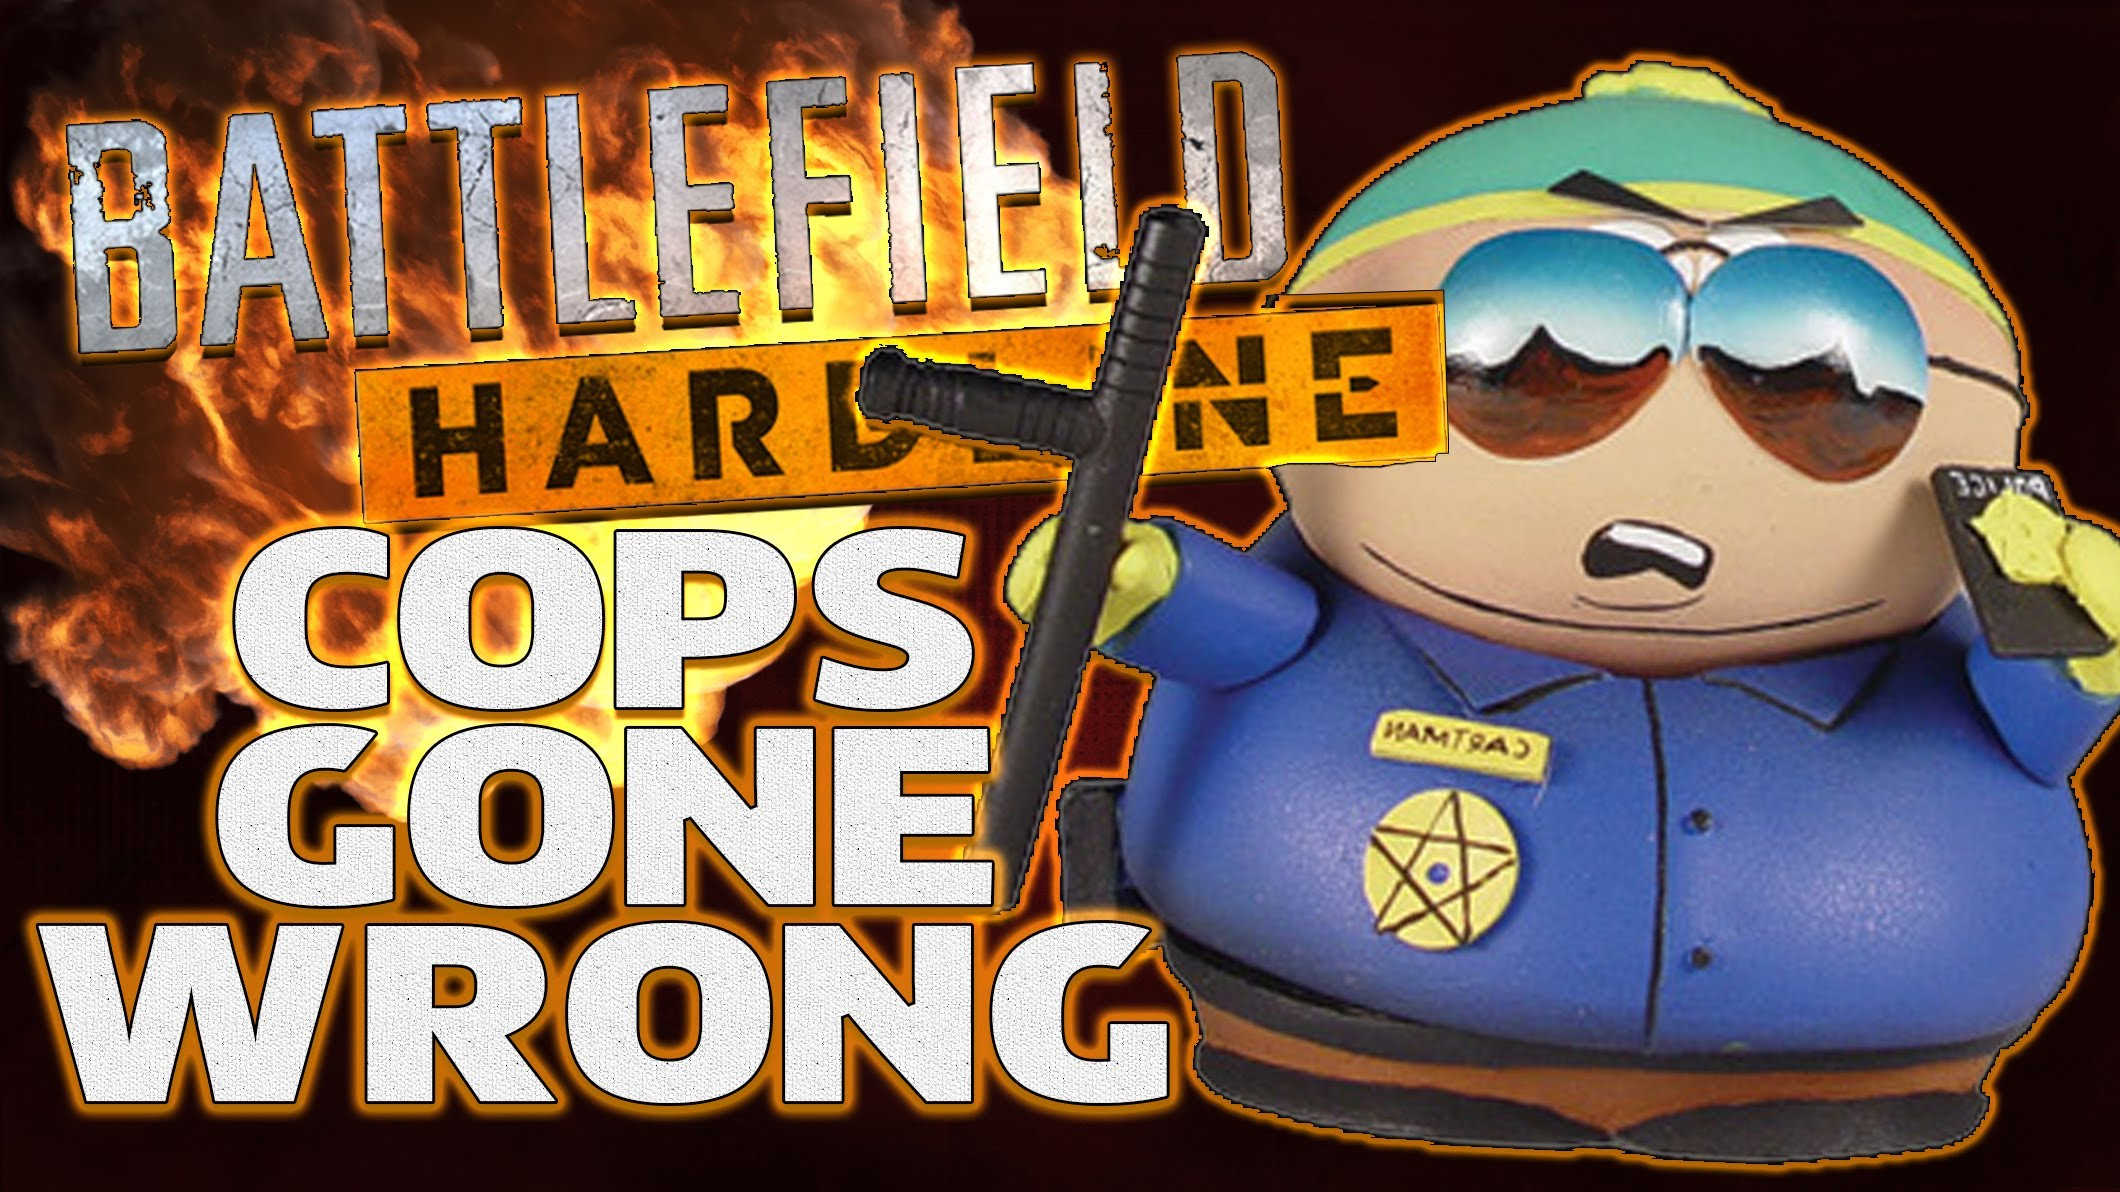 Battlefield hardline clipart royalty free stock Battlefield Hardline